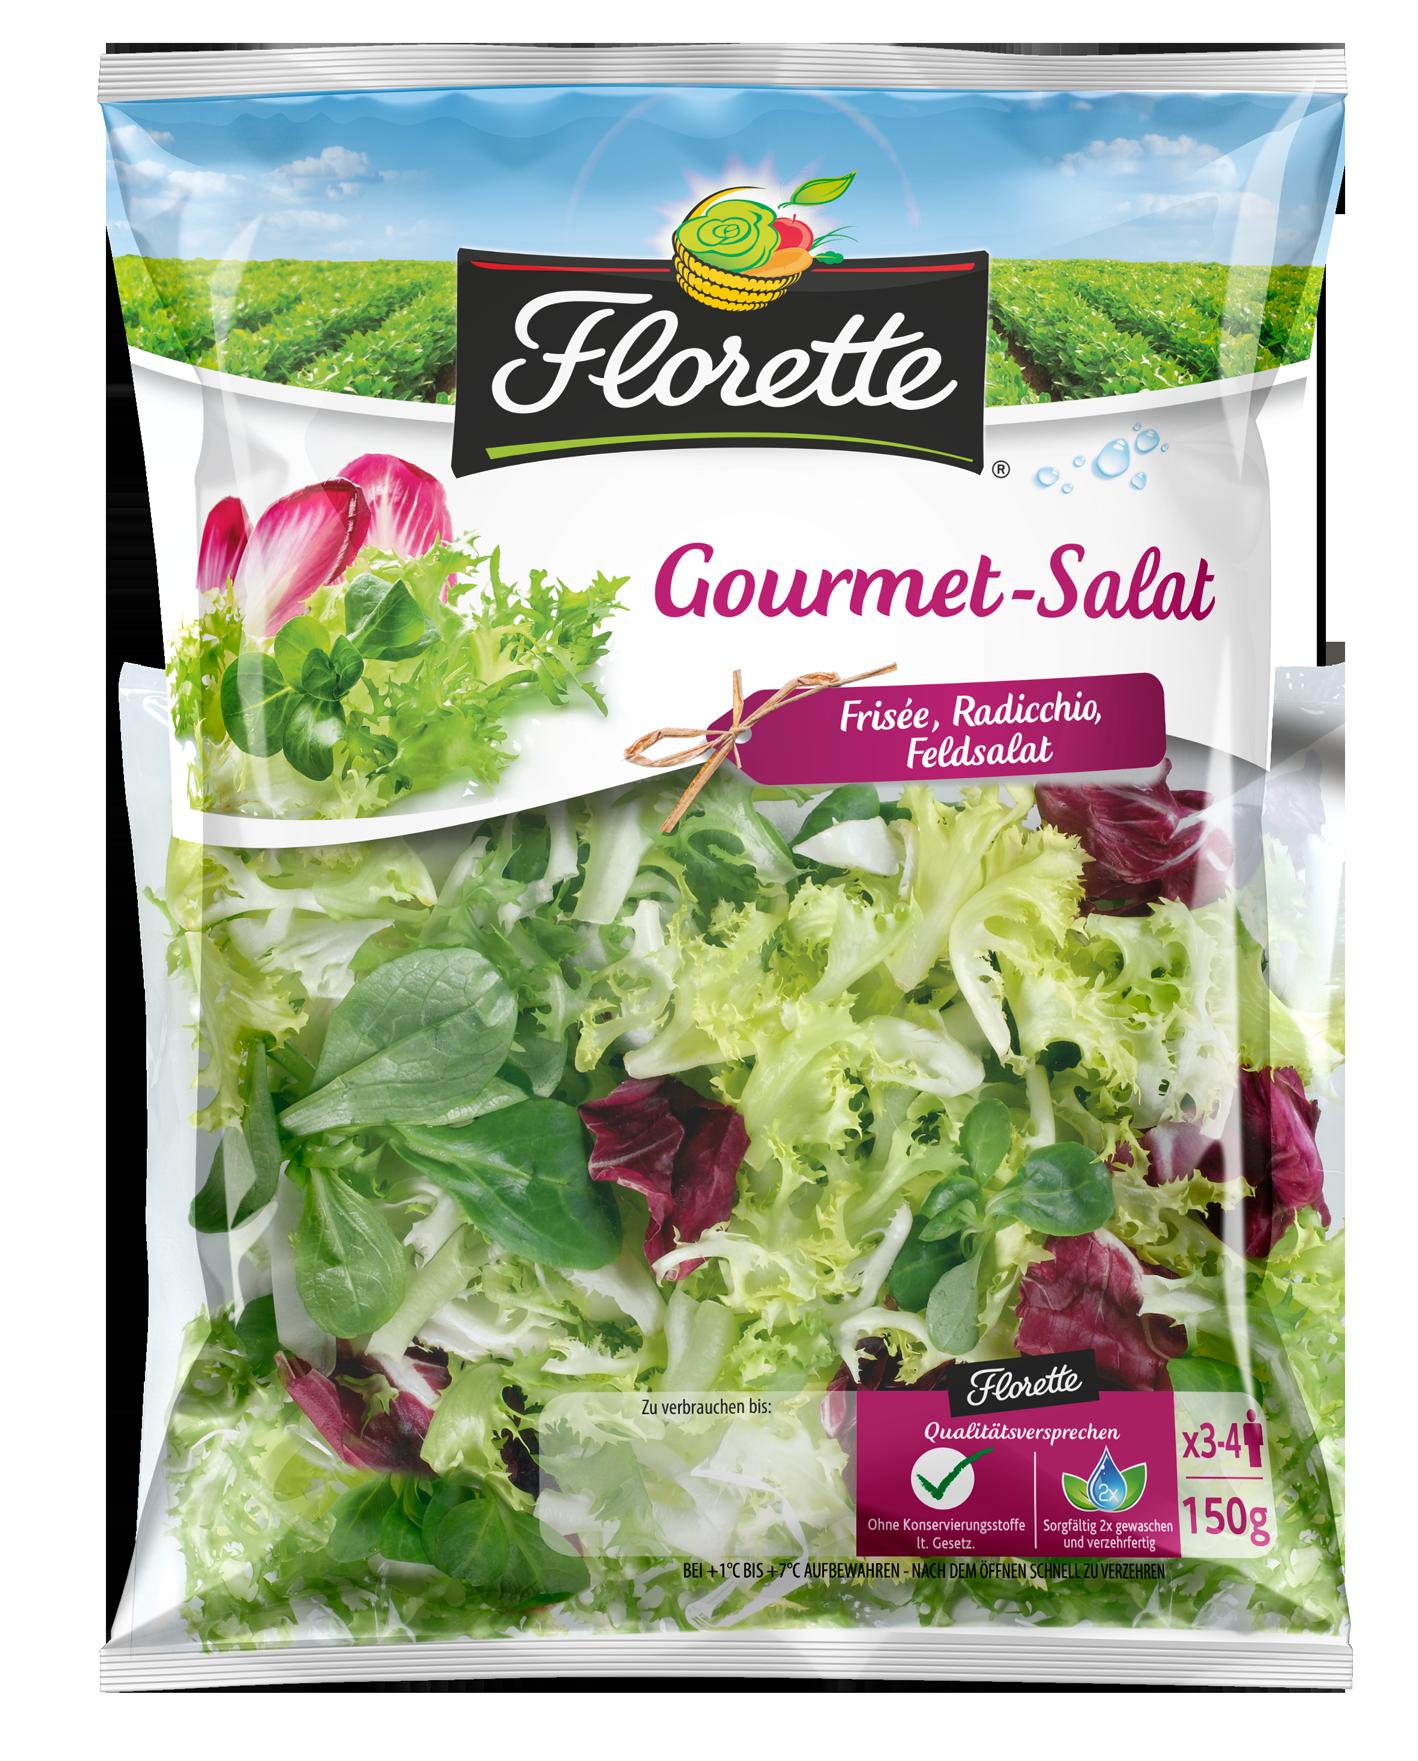 Florette Gourmet-Salat